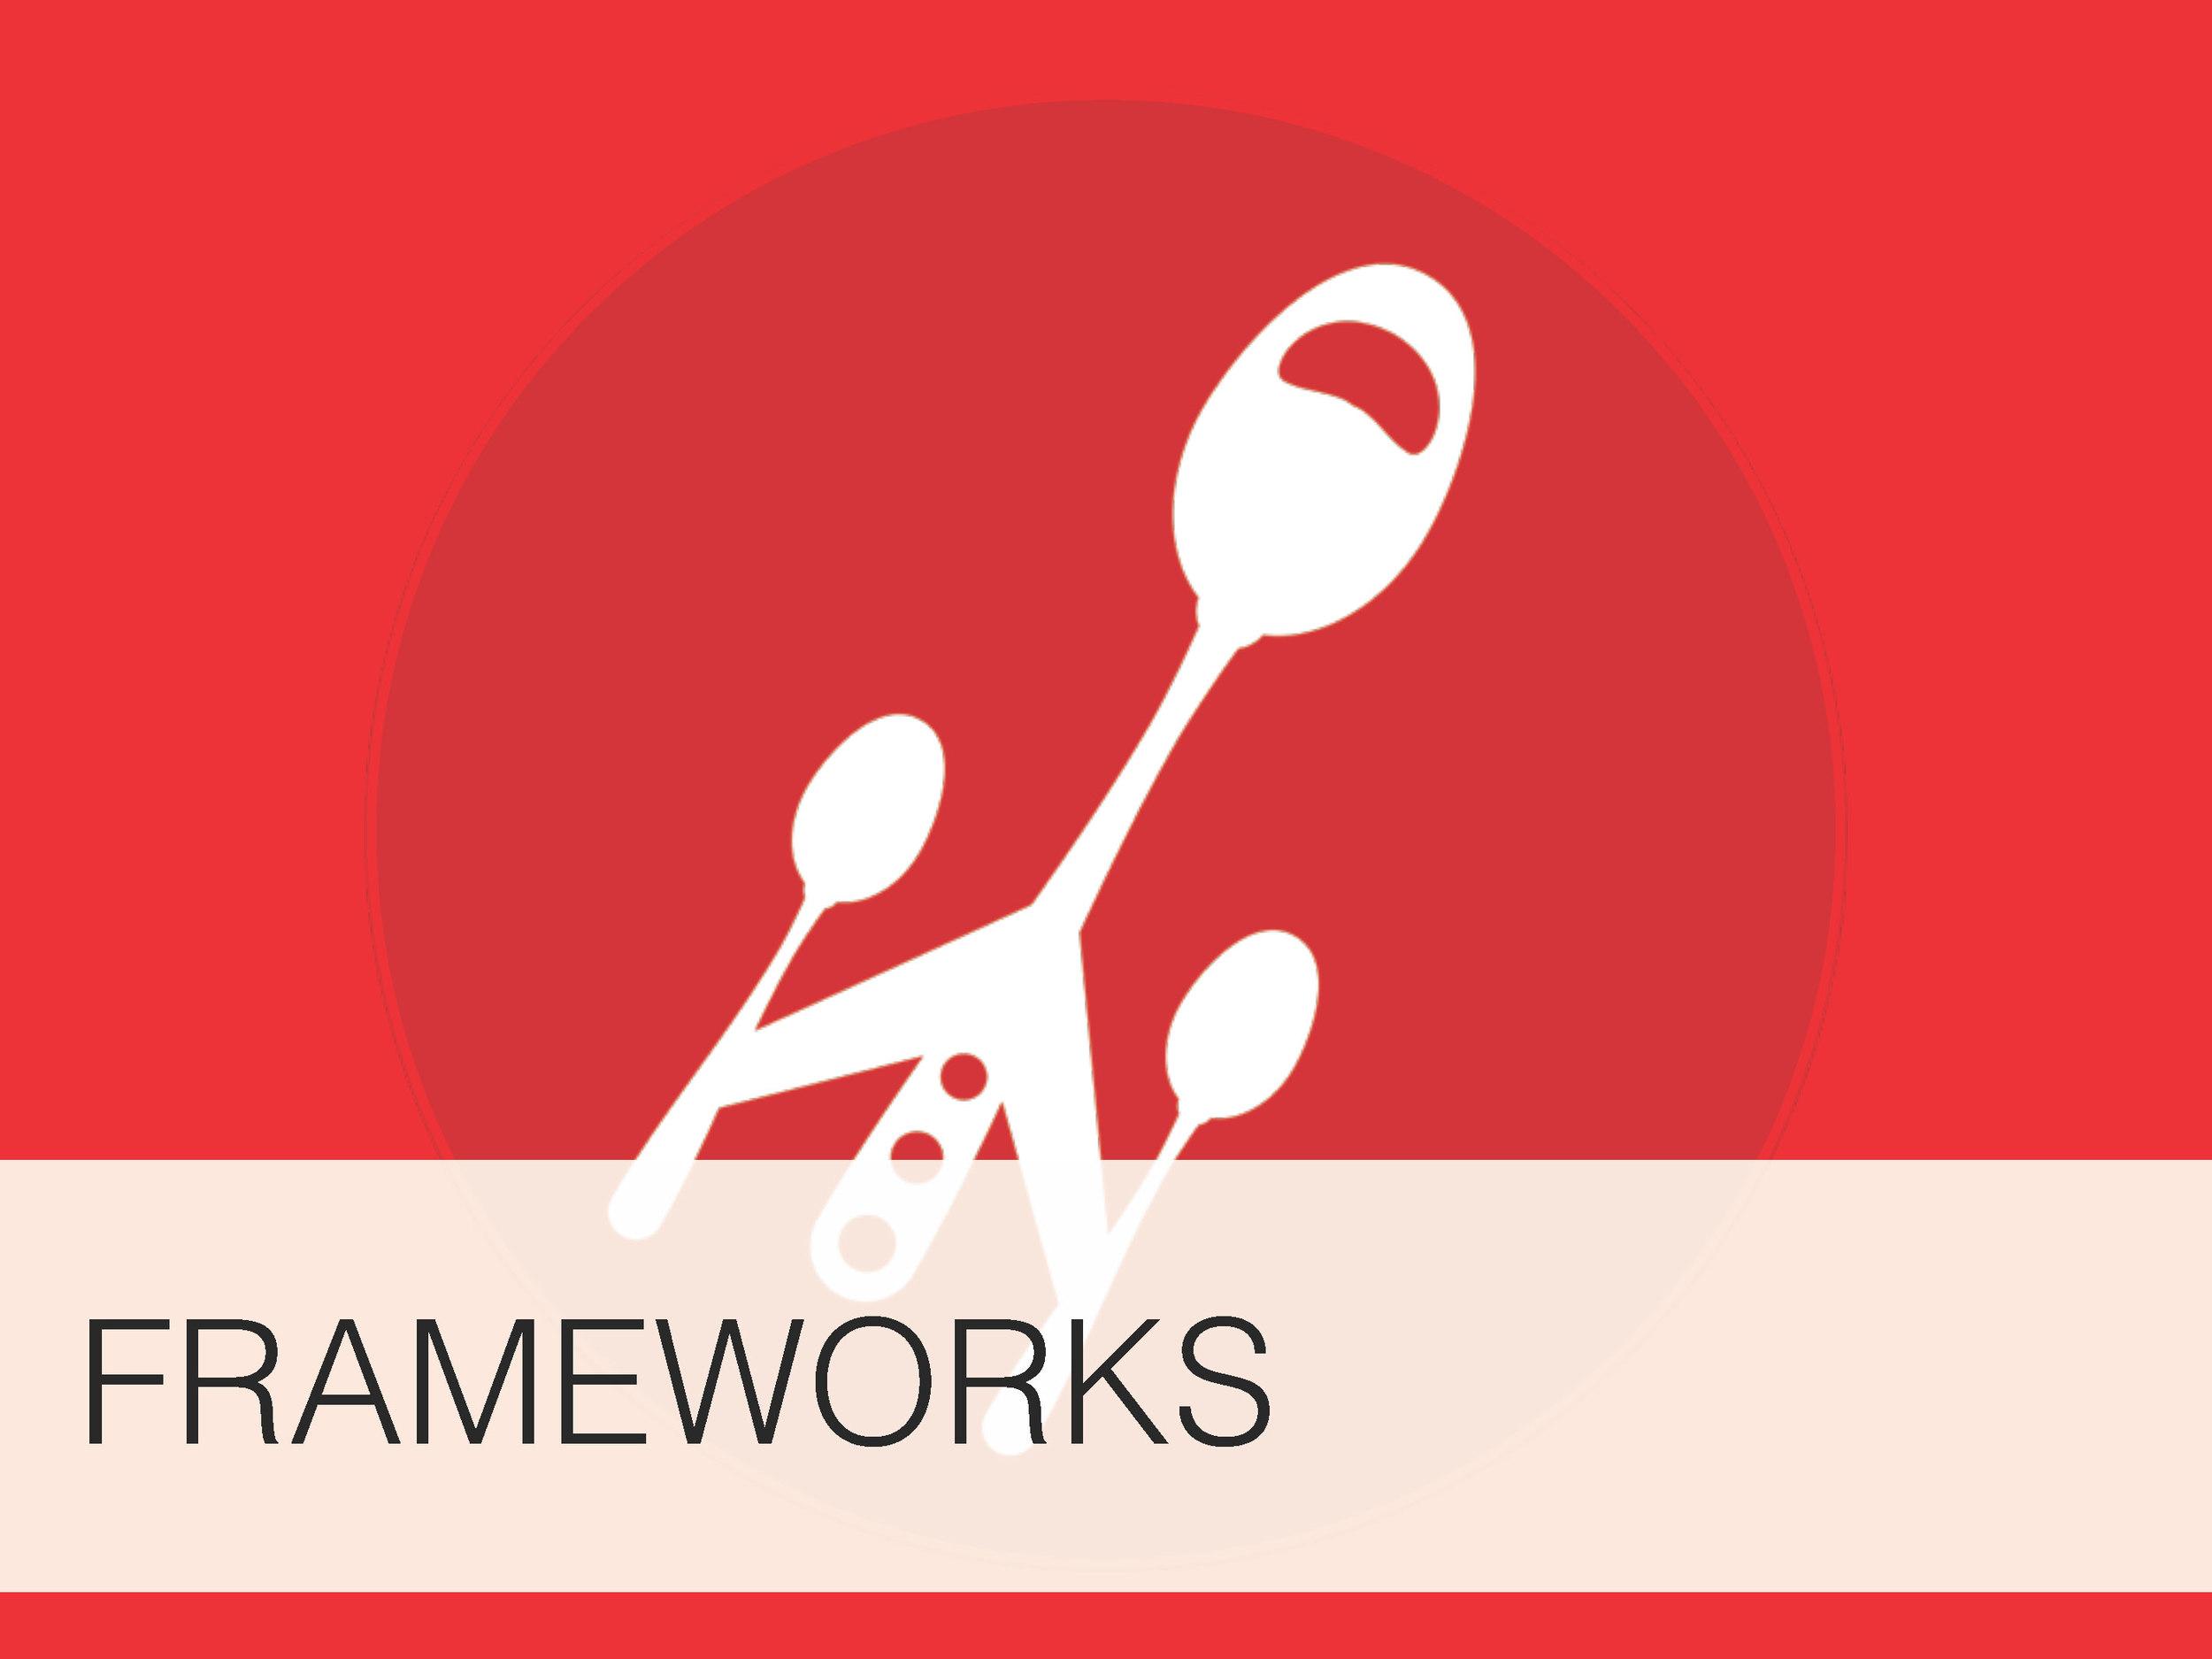 Project2_ResearchReadout_Final_Prez_Spoonrocket-novideo_Page_12.jpg